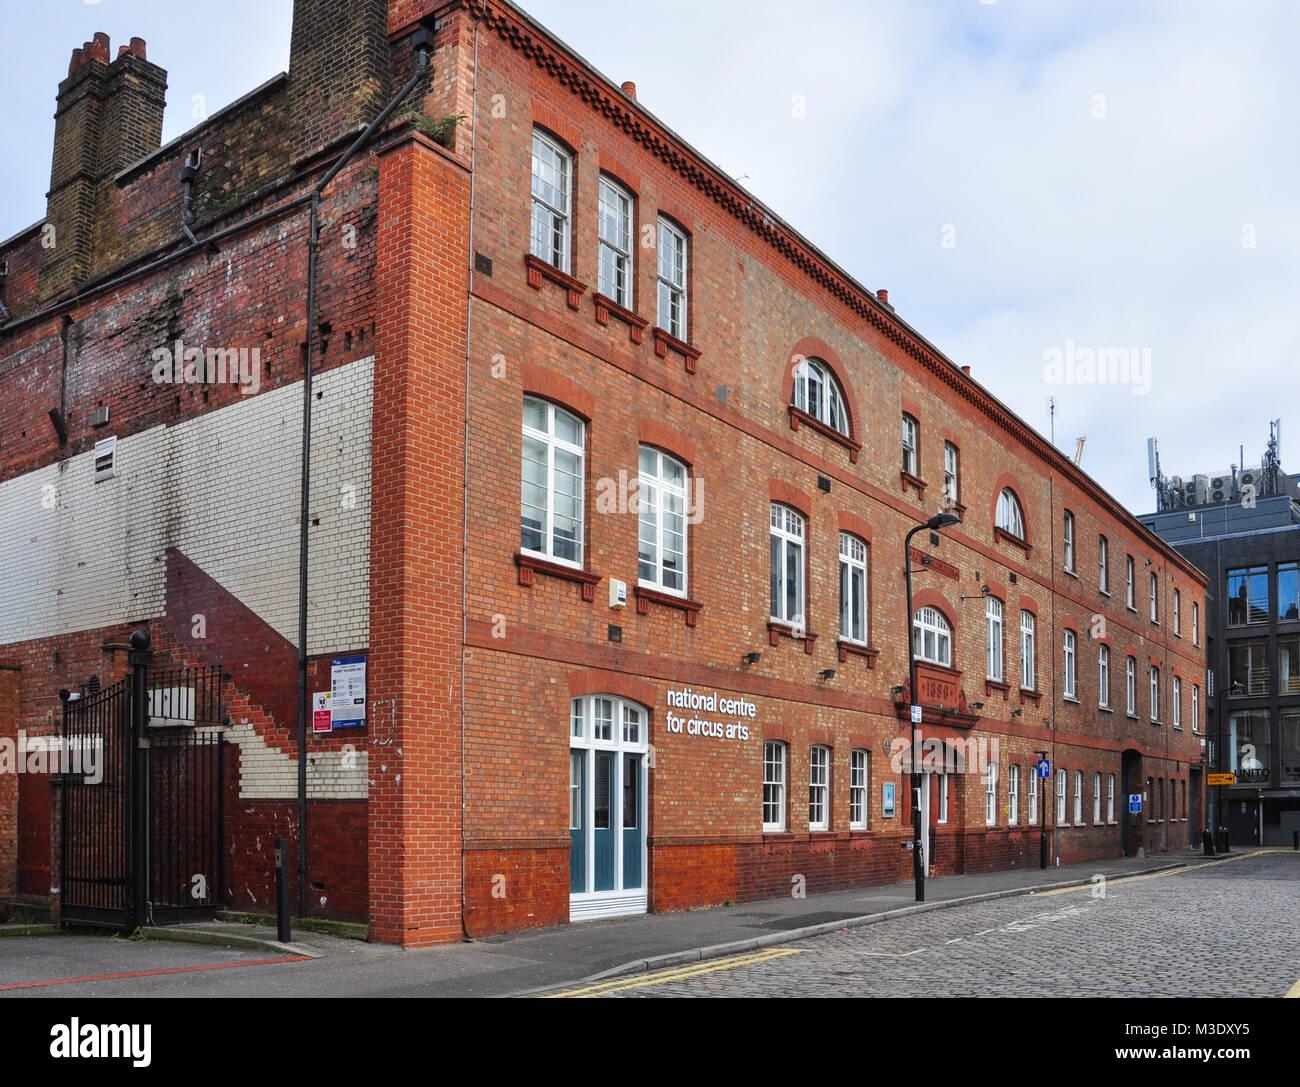 National Centre for Circus Arts, Coronet Street, London, N1, England, UK - Stock Image